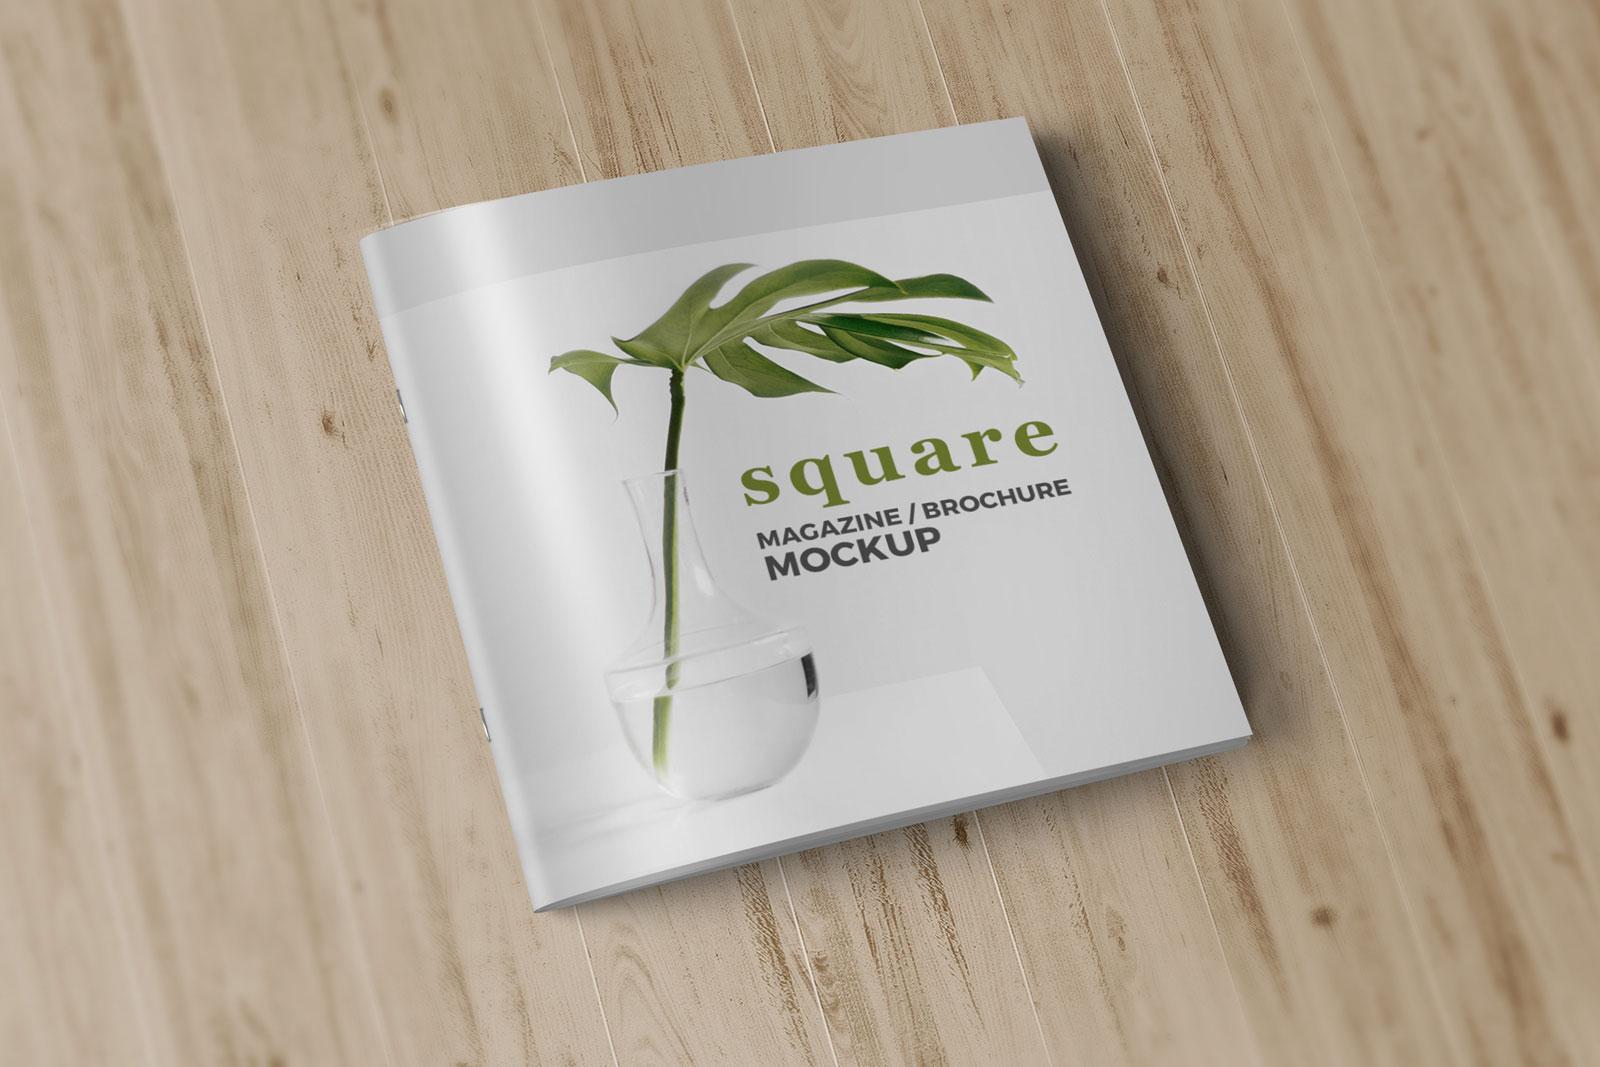 Free-Square-Brochure-Mockup-PSD-File (1)